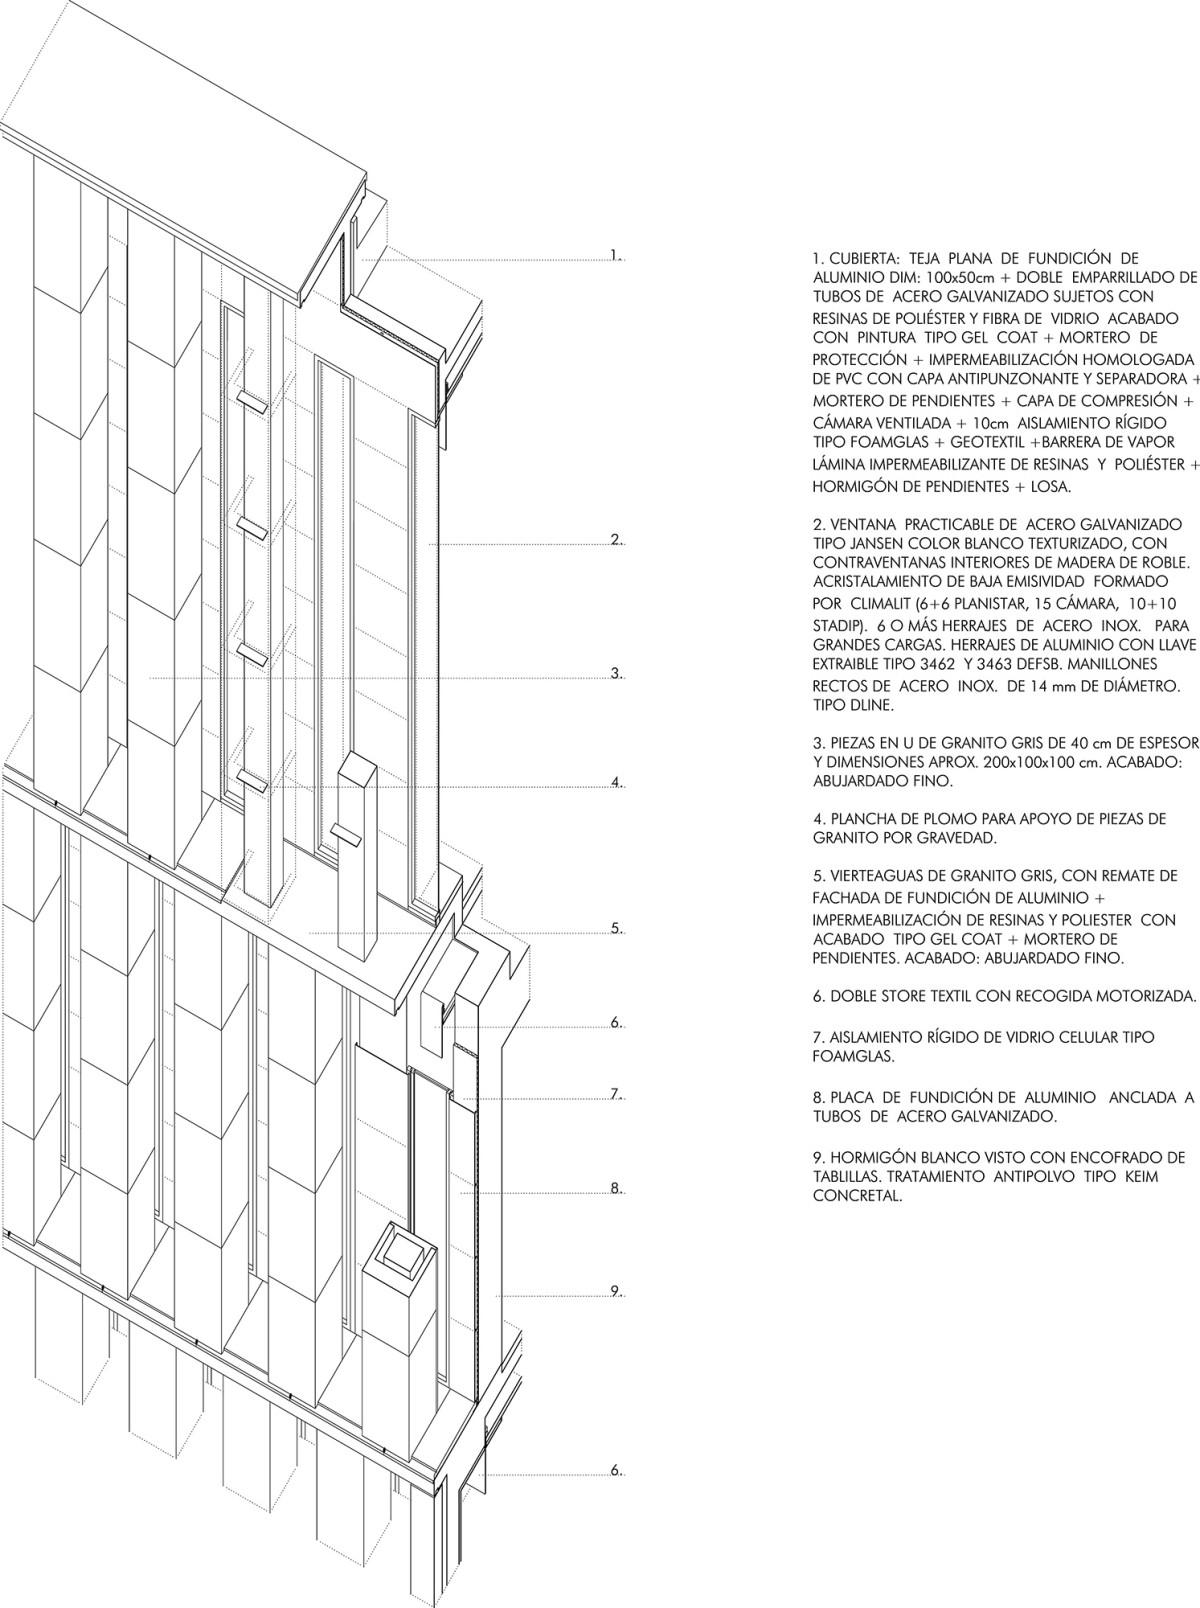 Mansilla + Tuñón . details (1)